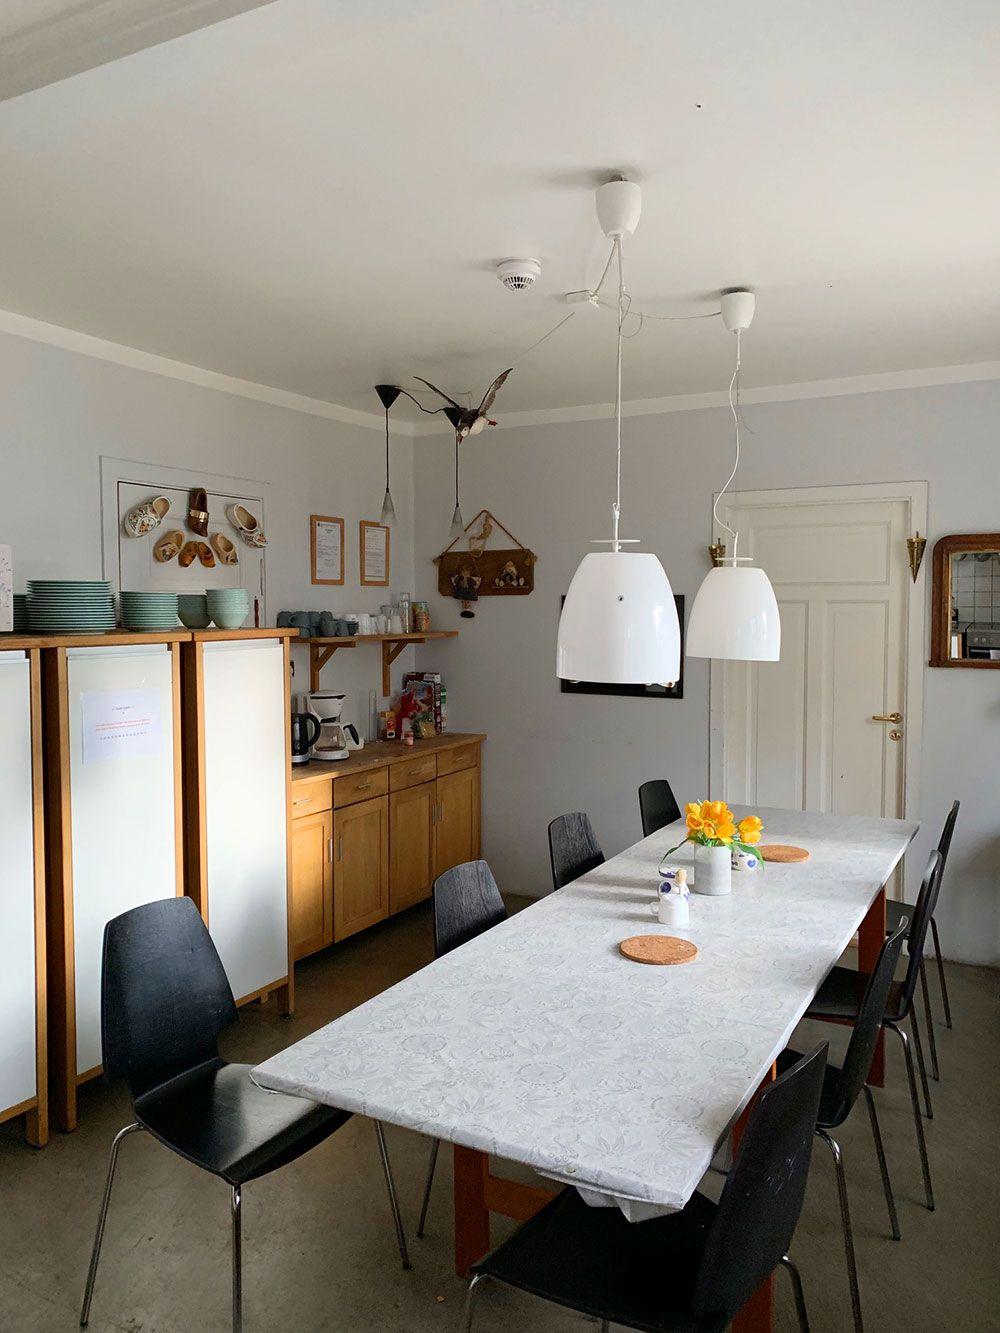 Alojamiento en Islandia - Loki Guesthouse - Mesa de la cocina